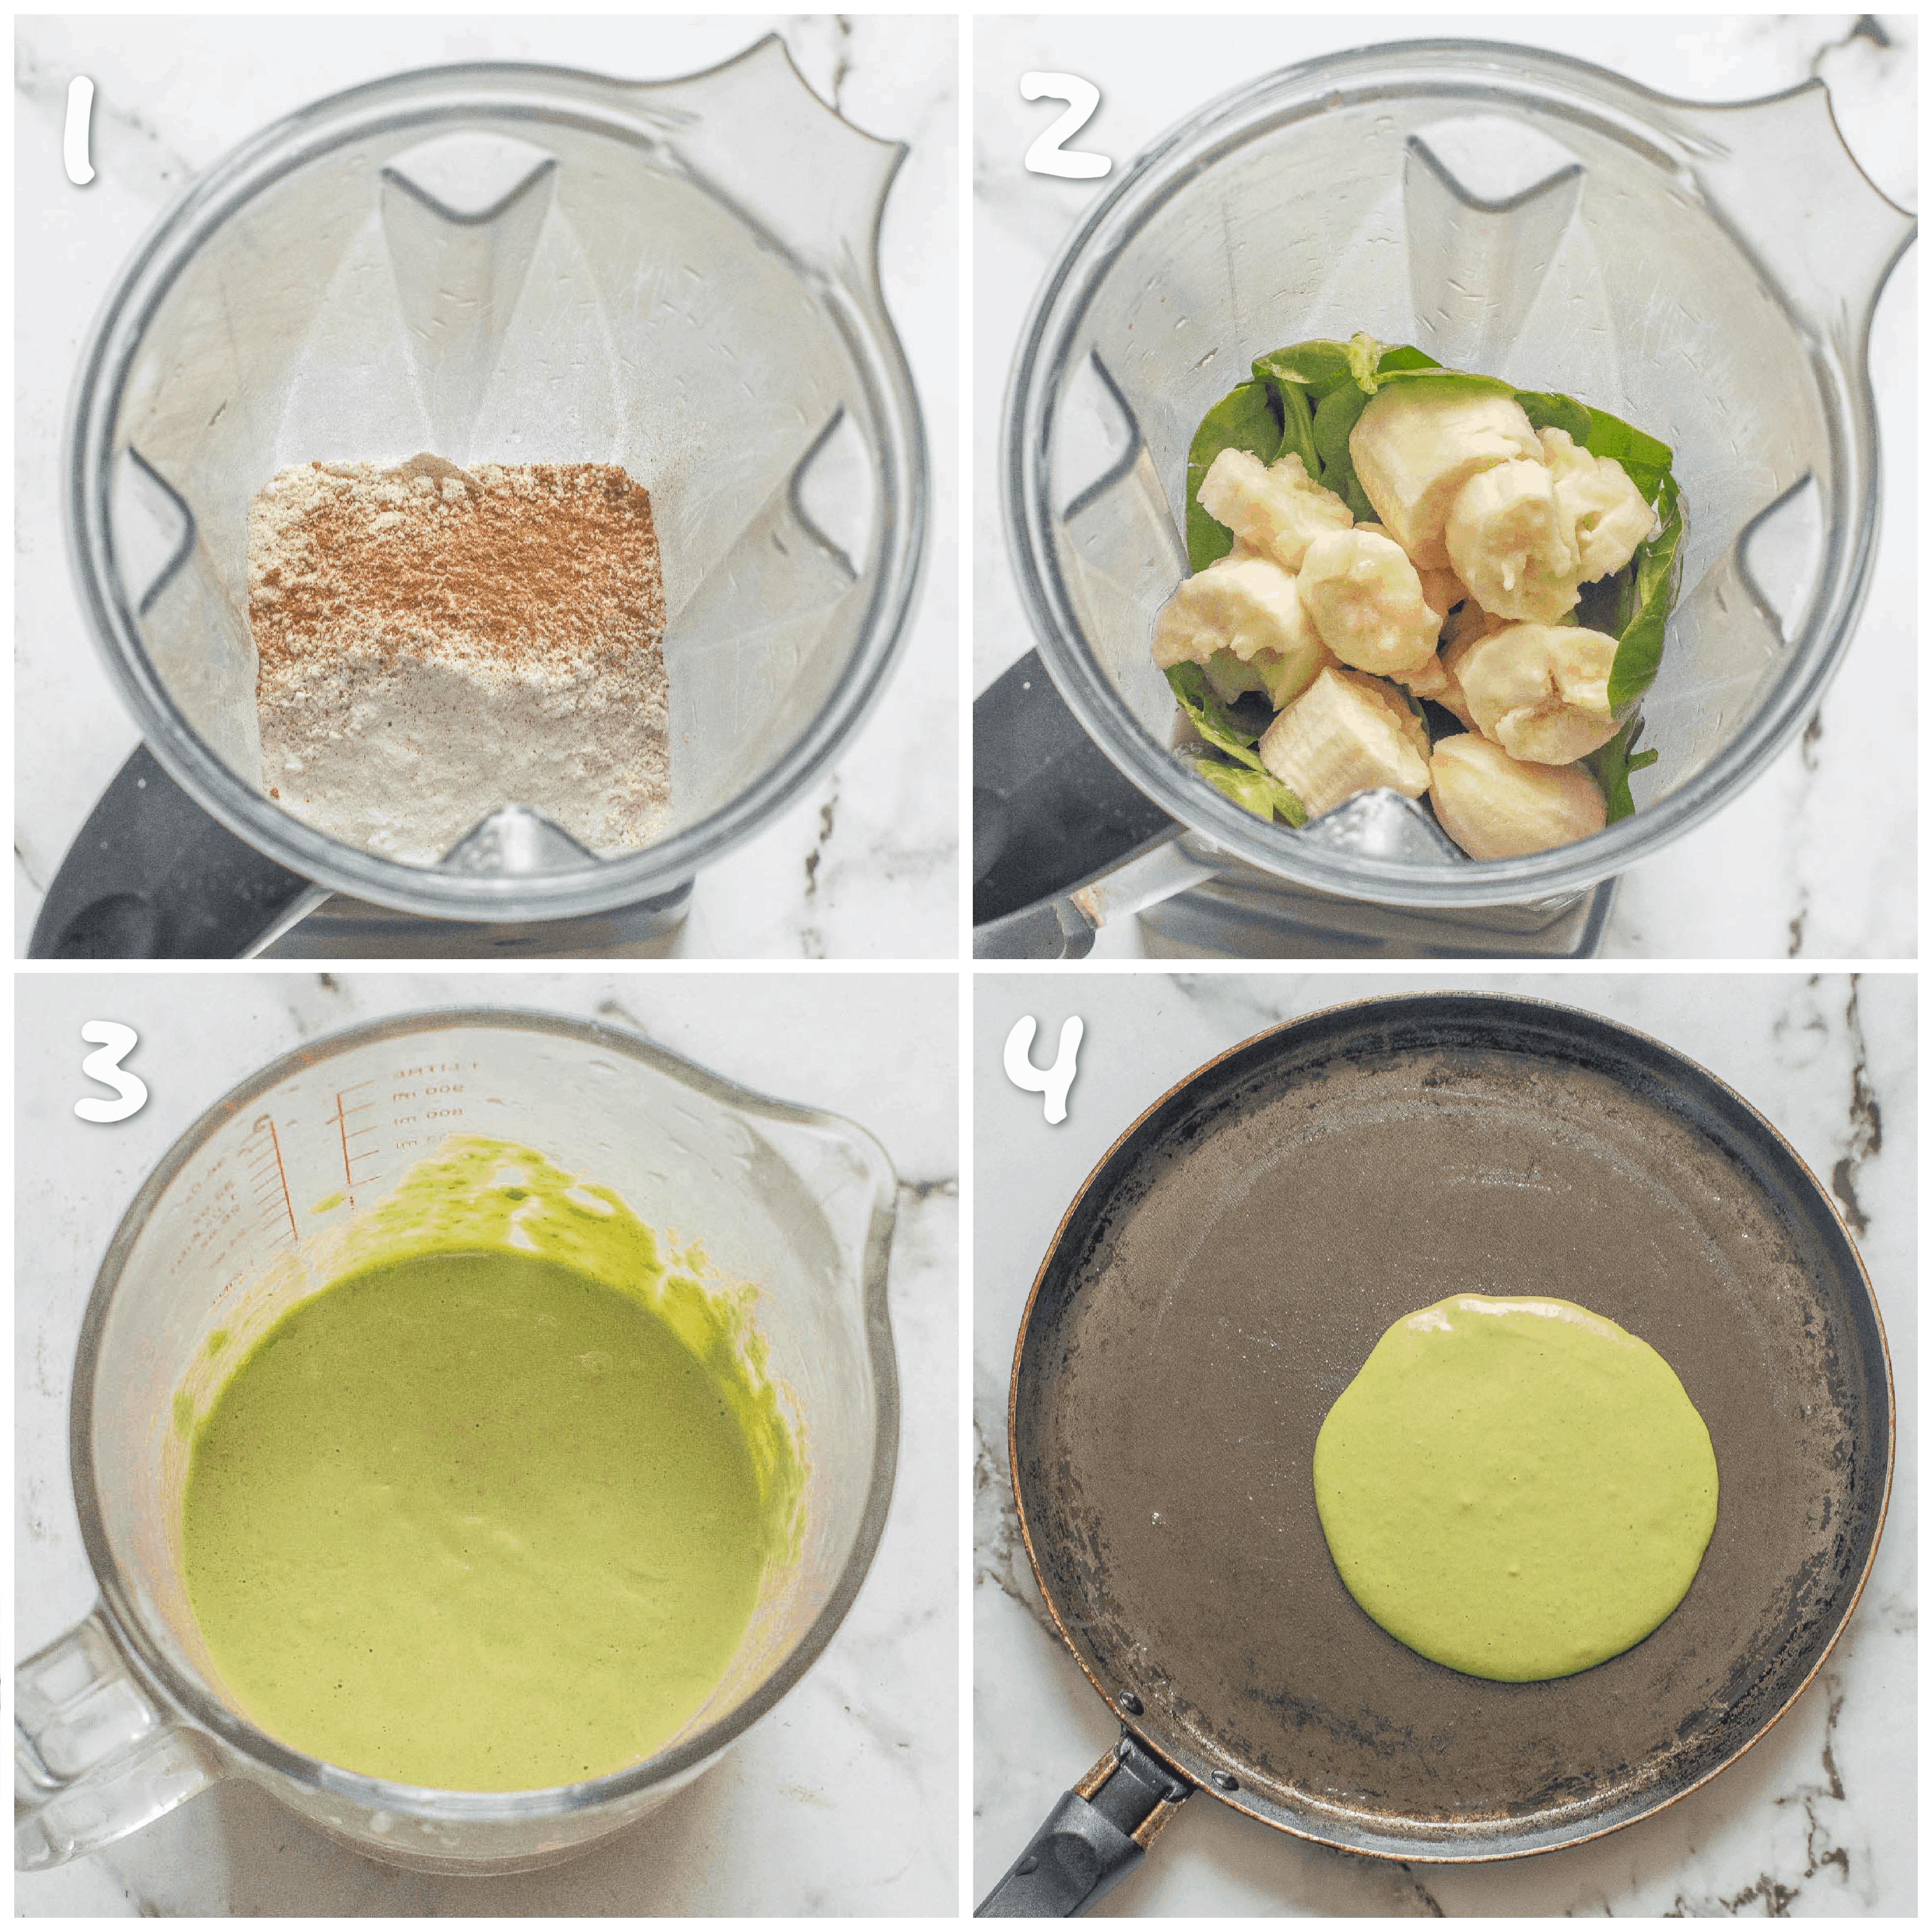 step1-4 pureeing the pancake mix